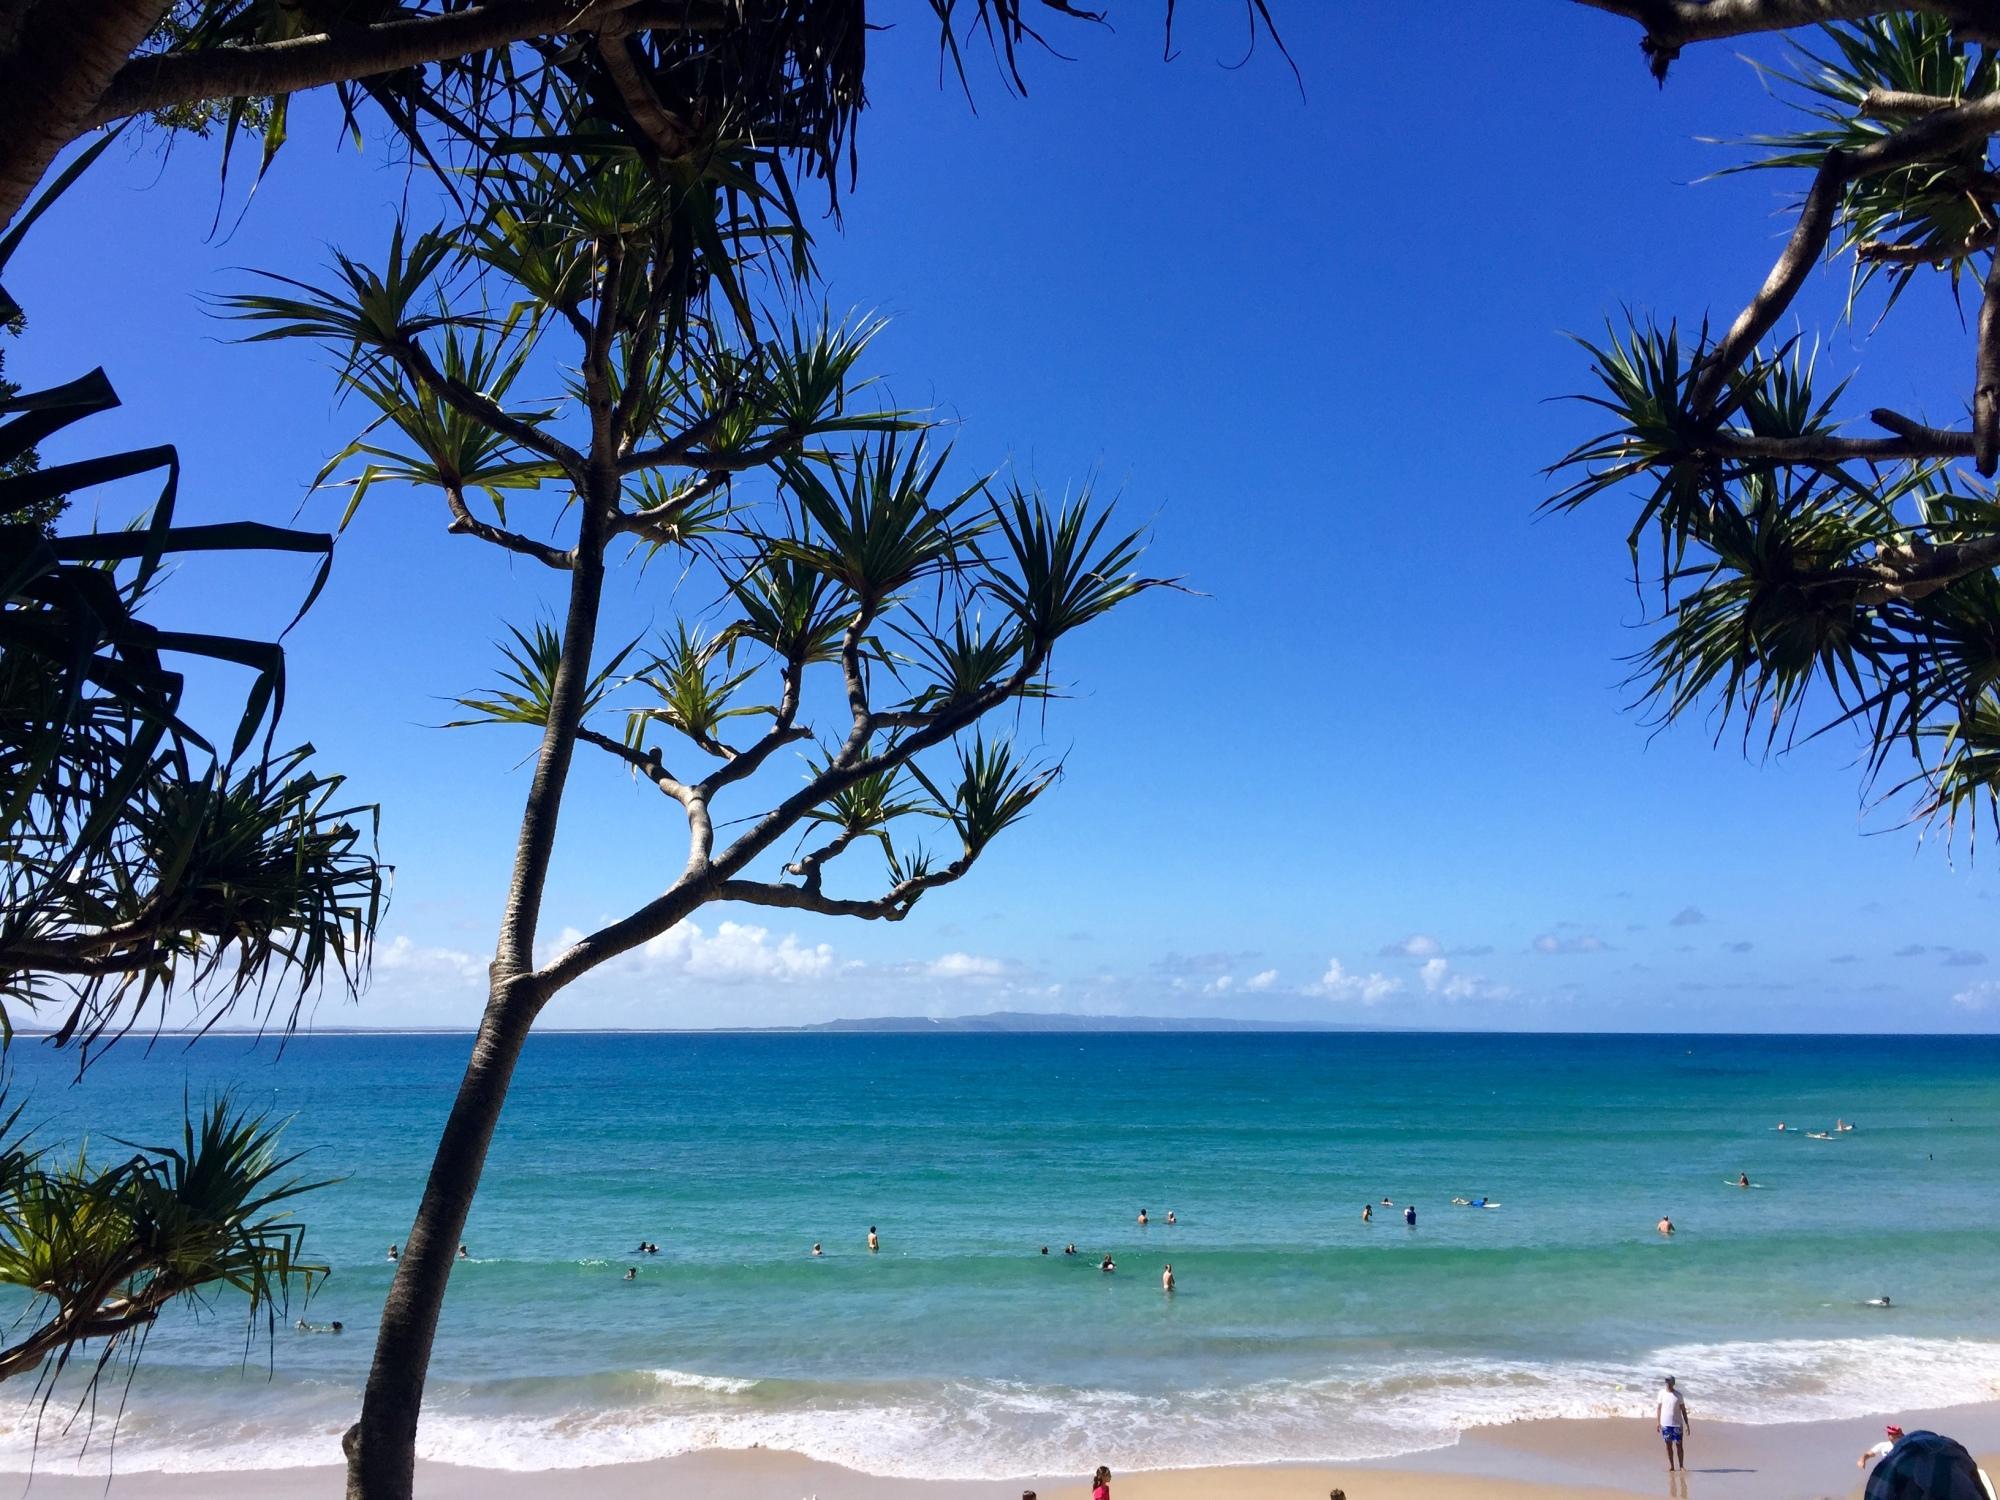 Noosa Cove, Queensland - Australia